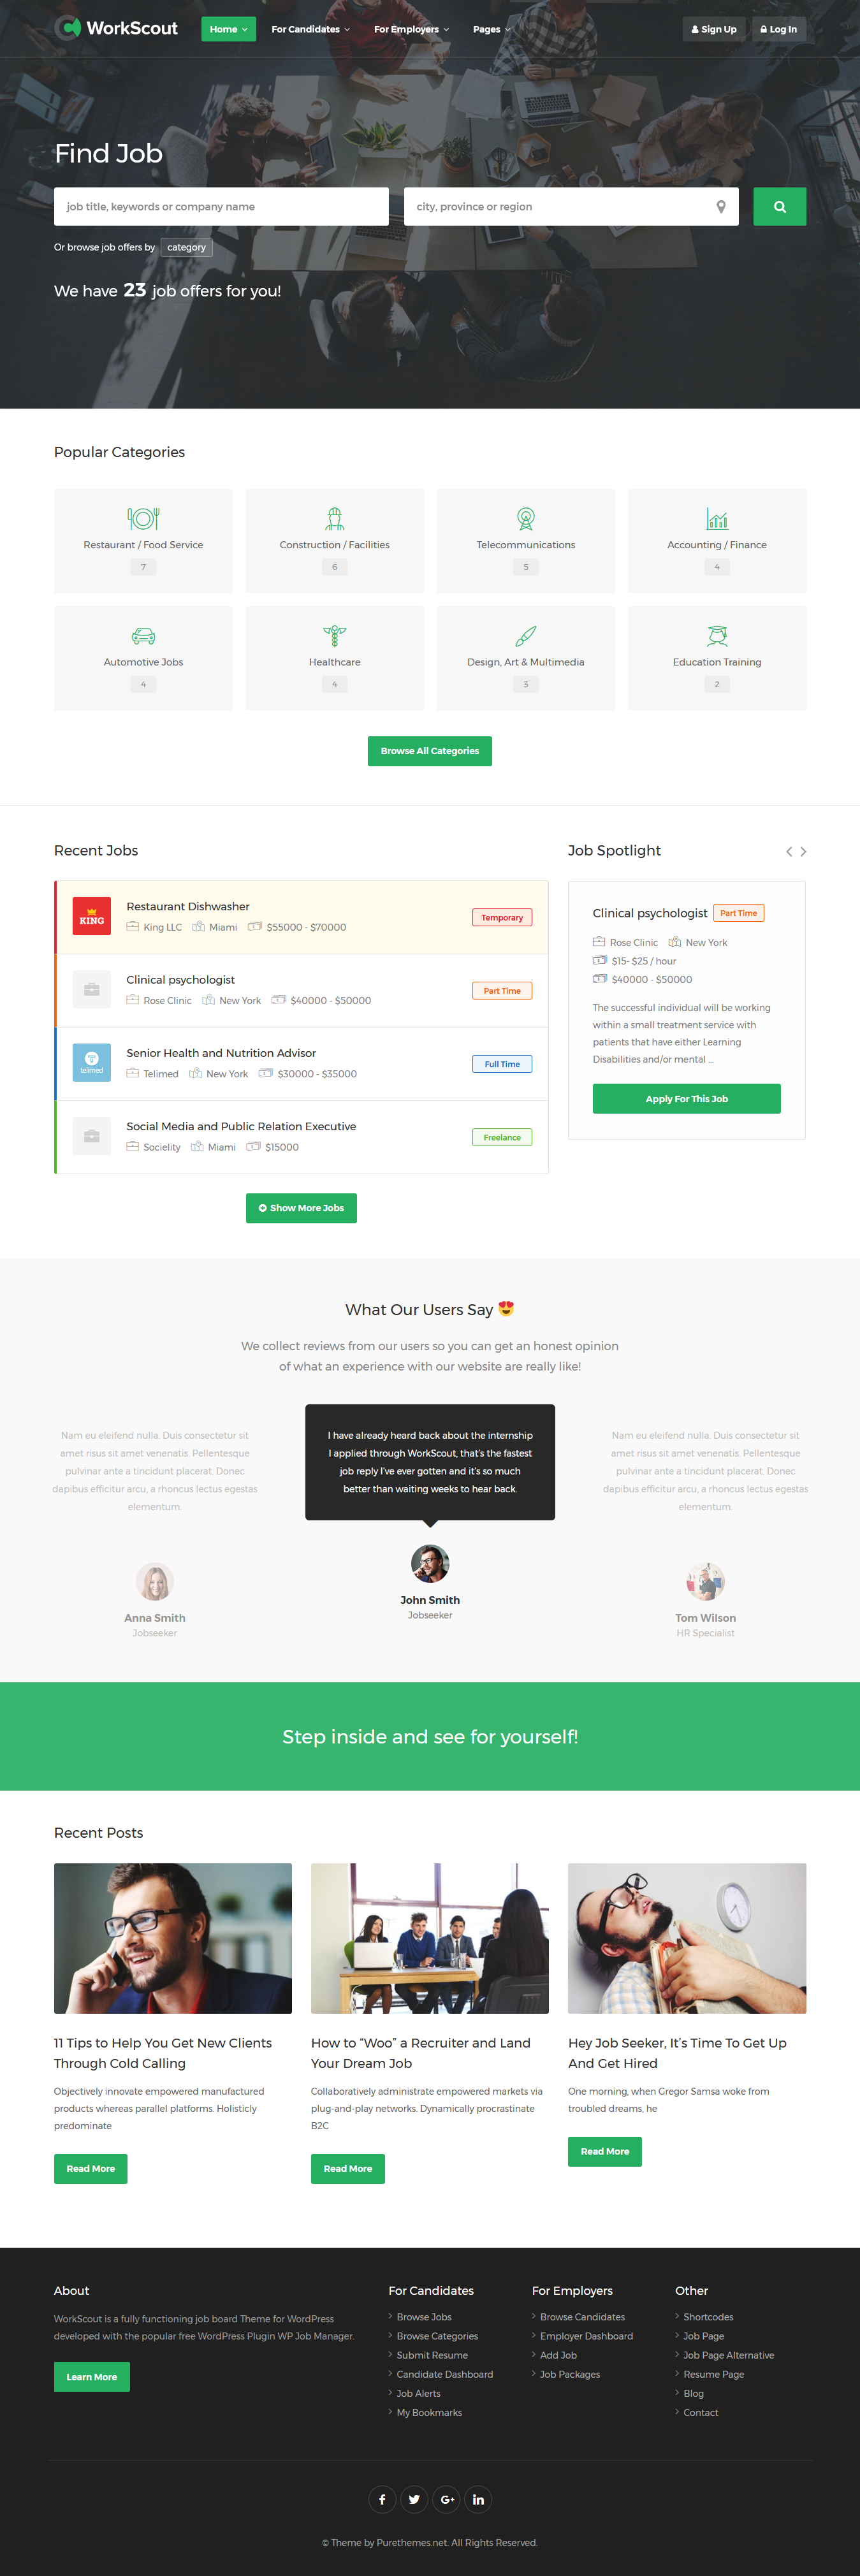 workscout best premium job board wordpress theme - 10+ Best Premium Job Board WordPress Themes